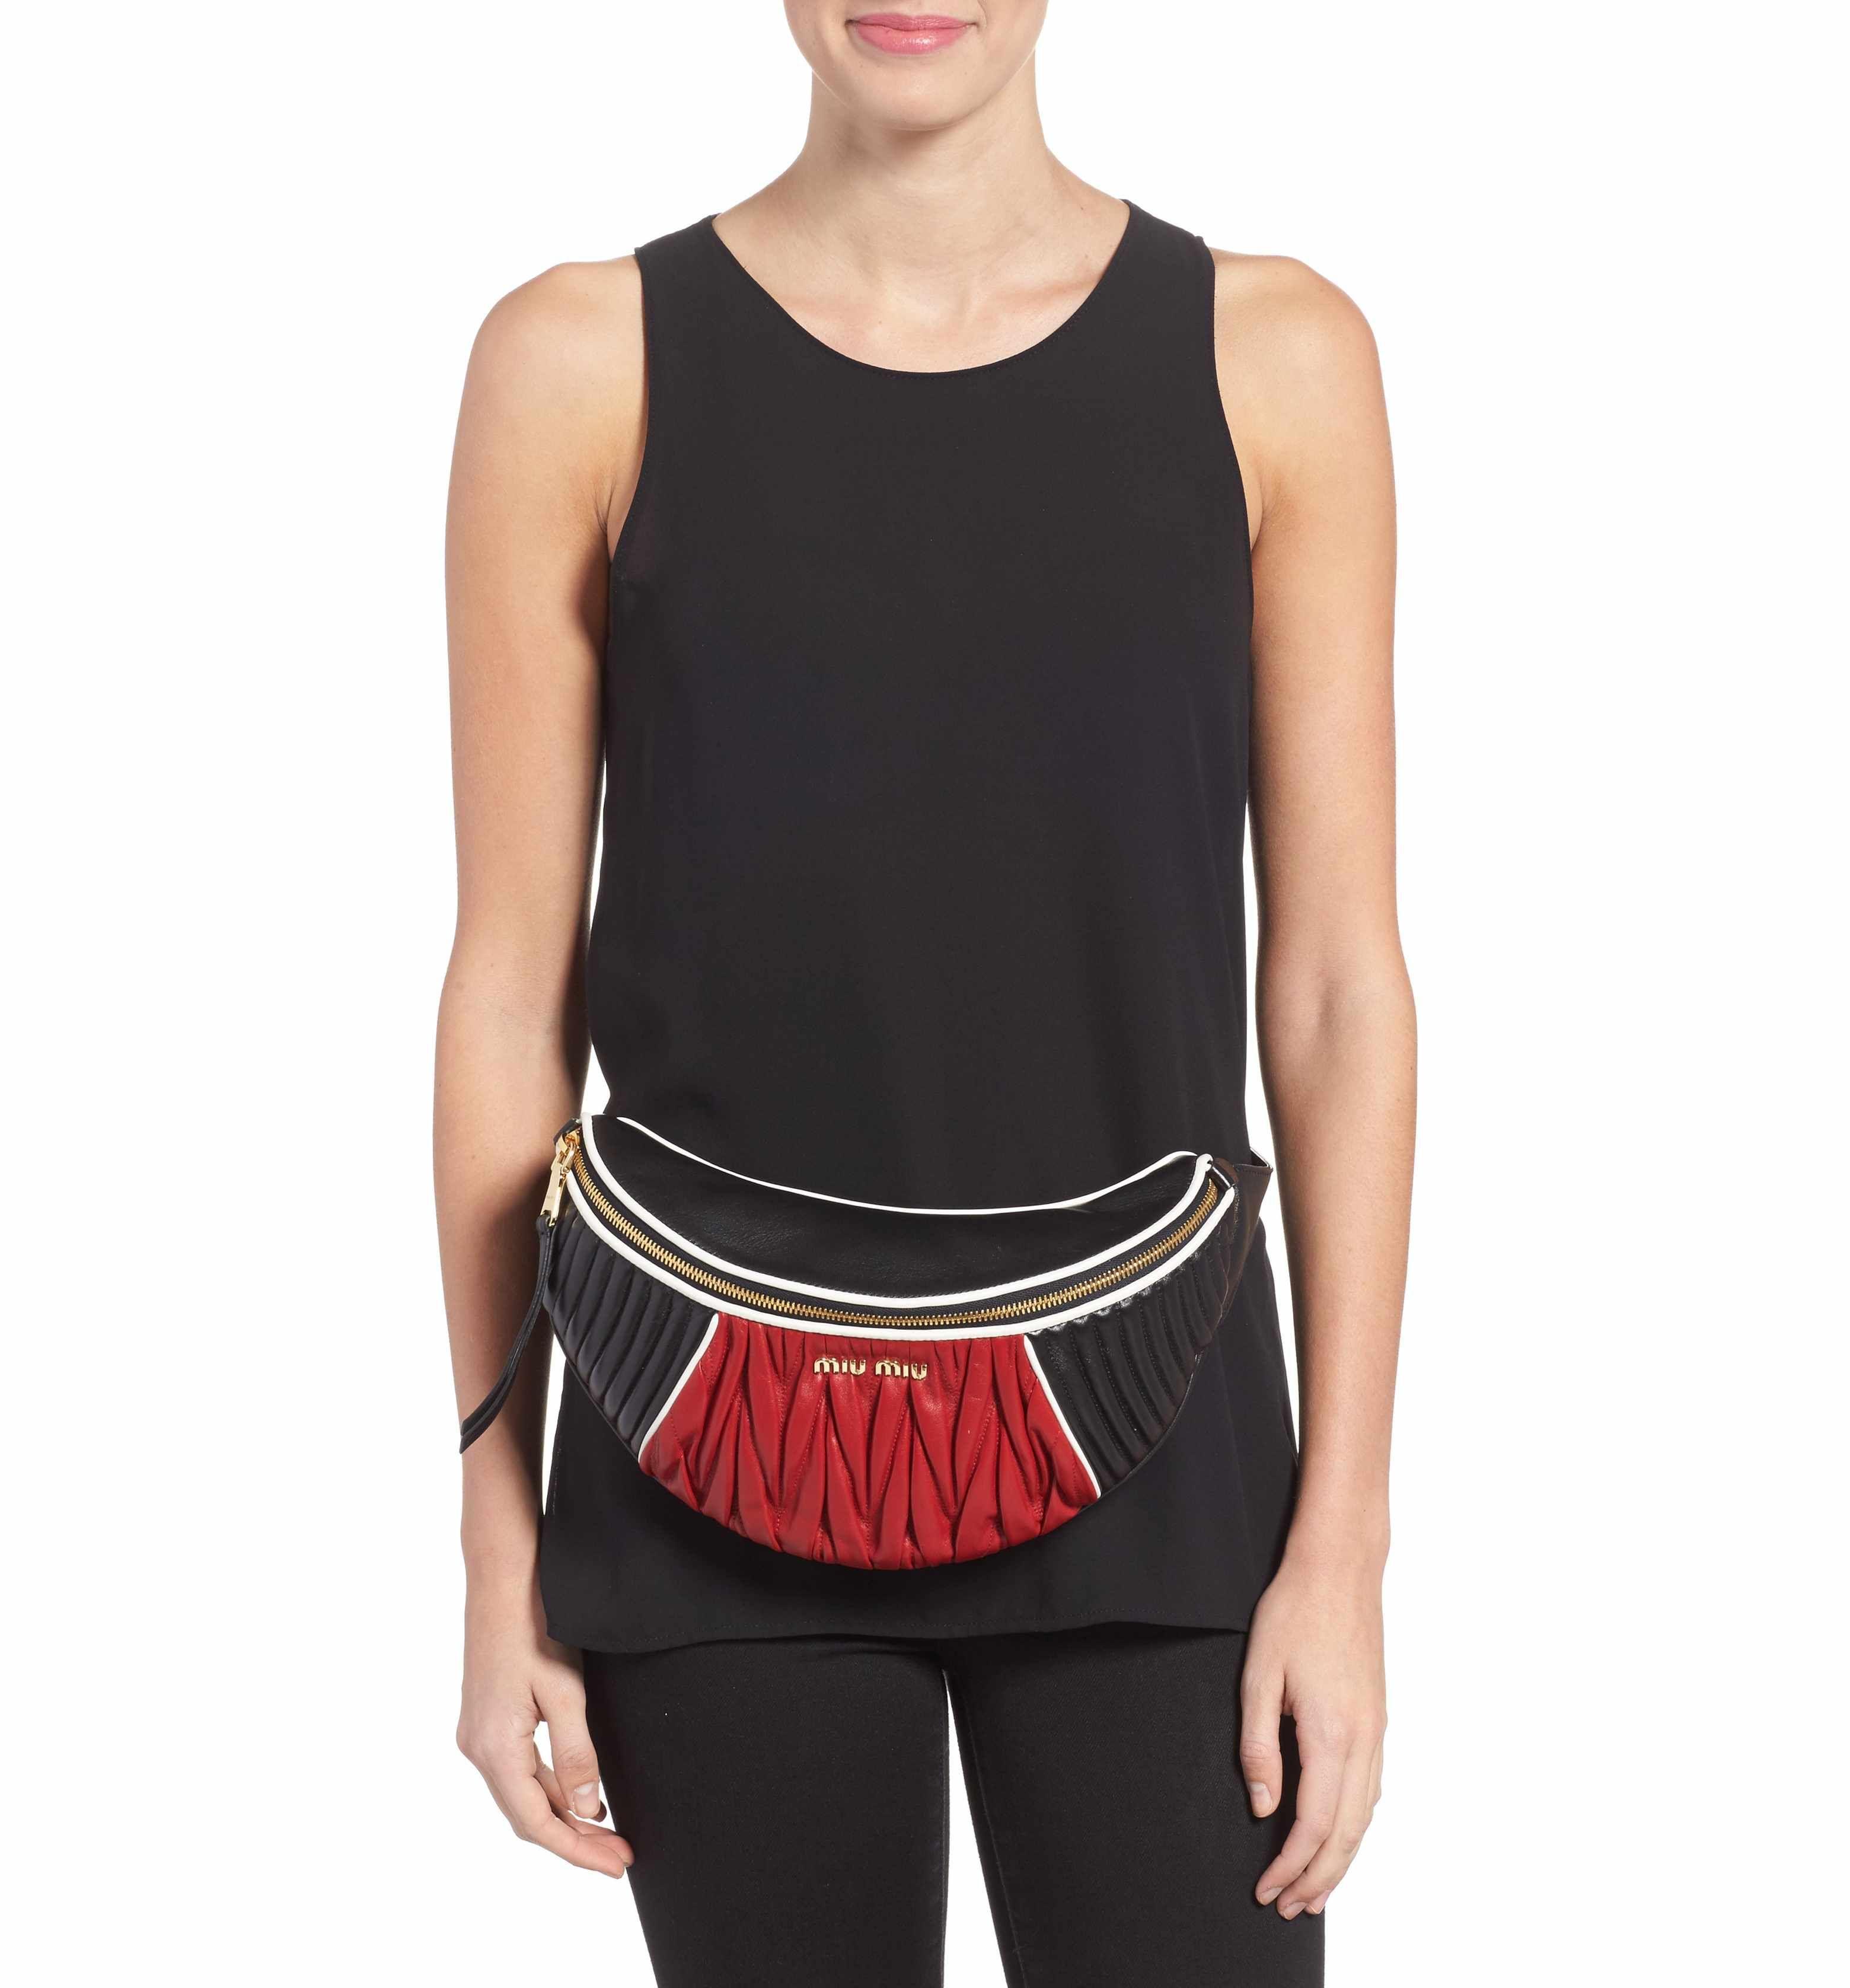 e218586d8b8a Miu Miu Rider Matelassé Leather Belt Bag | KABELKY / HANDBAGS & BAGS ...